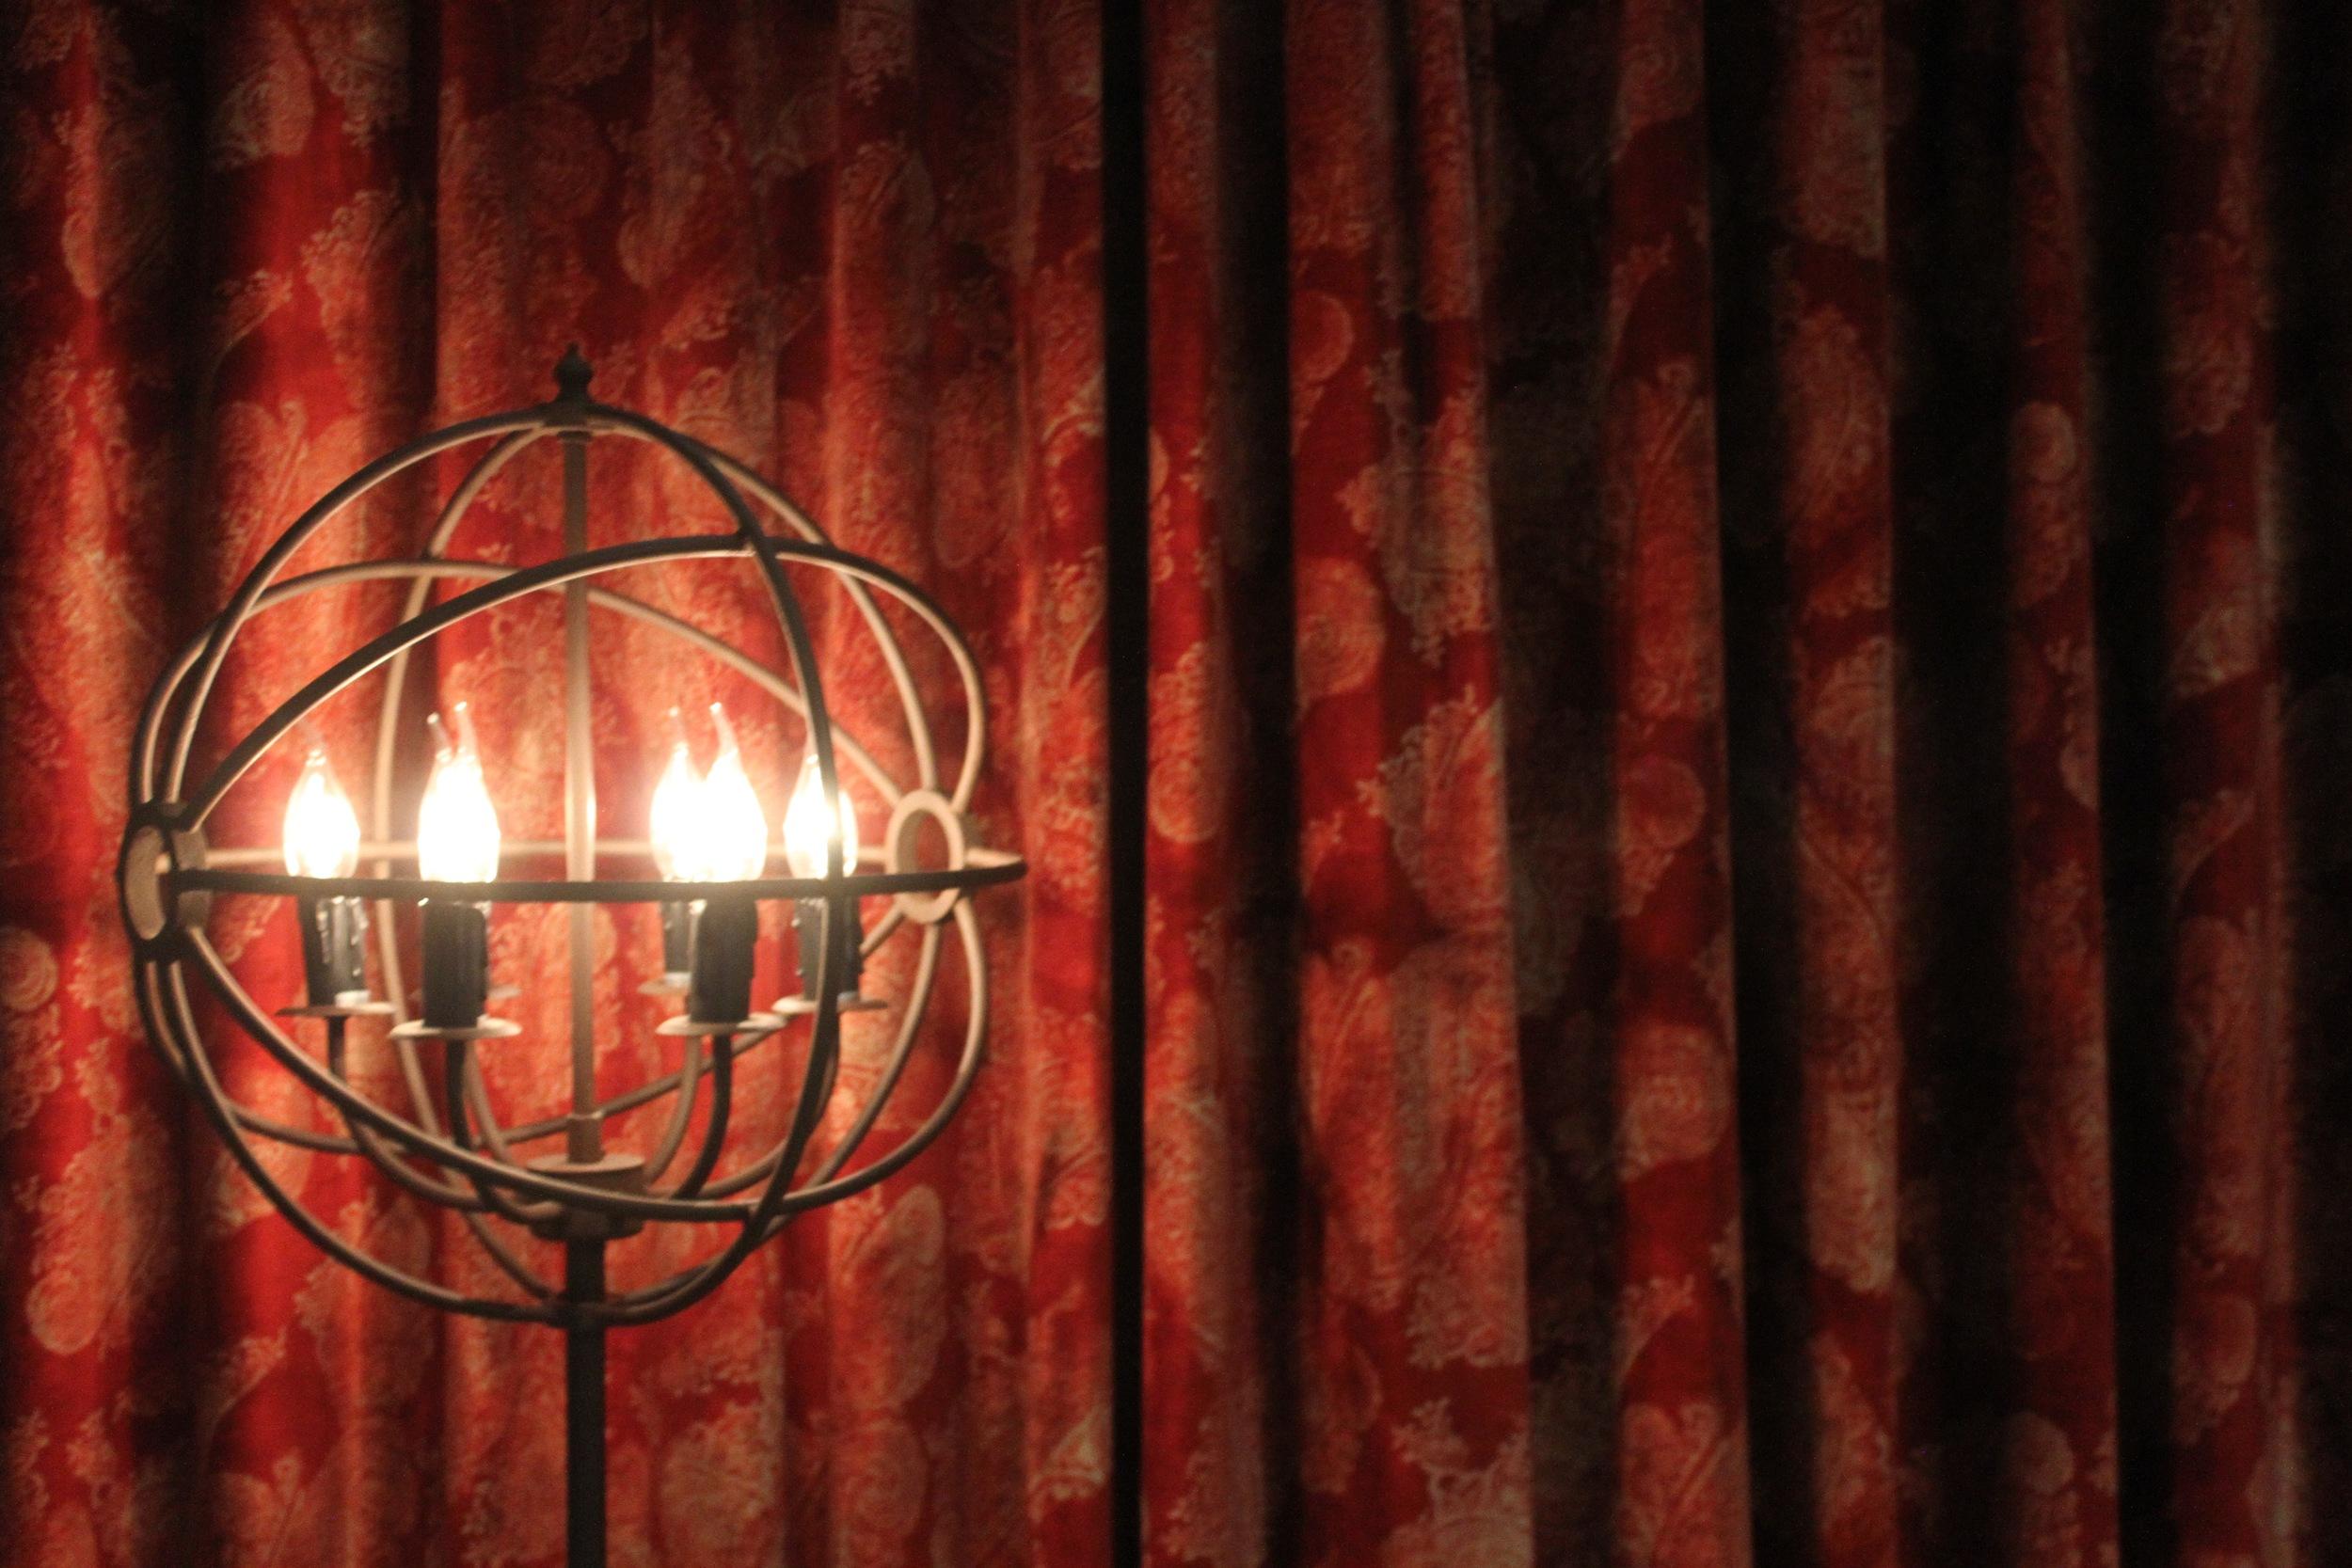 Eyebrook sitting curtains and lamp closeup.jpg